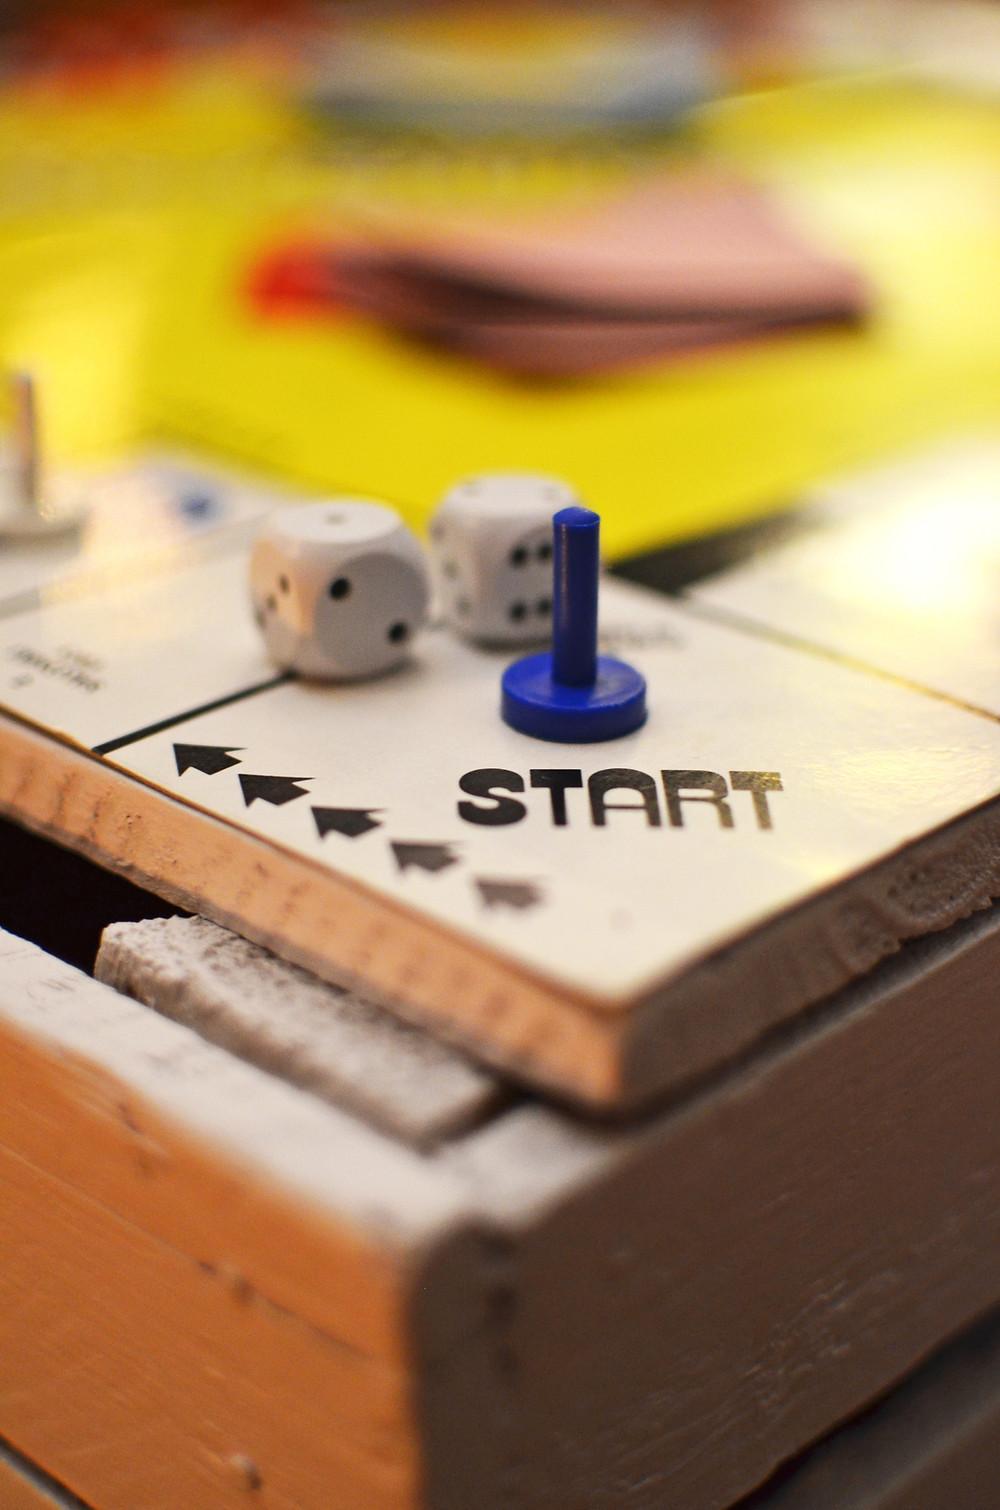 Board game blue piece start spot